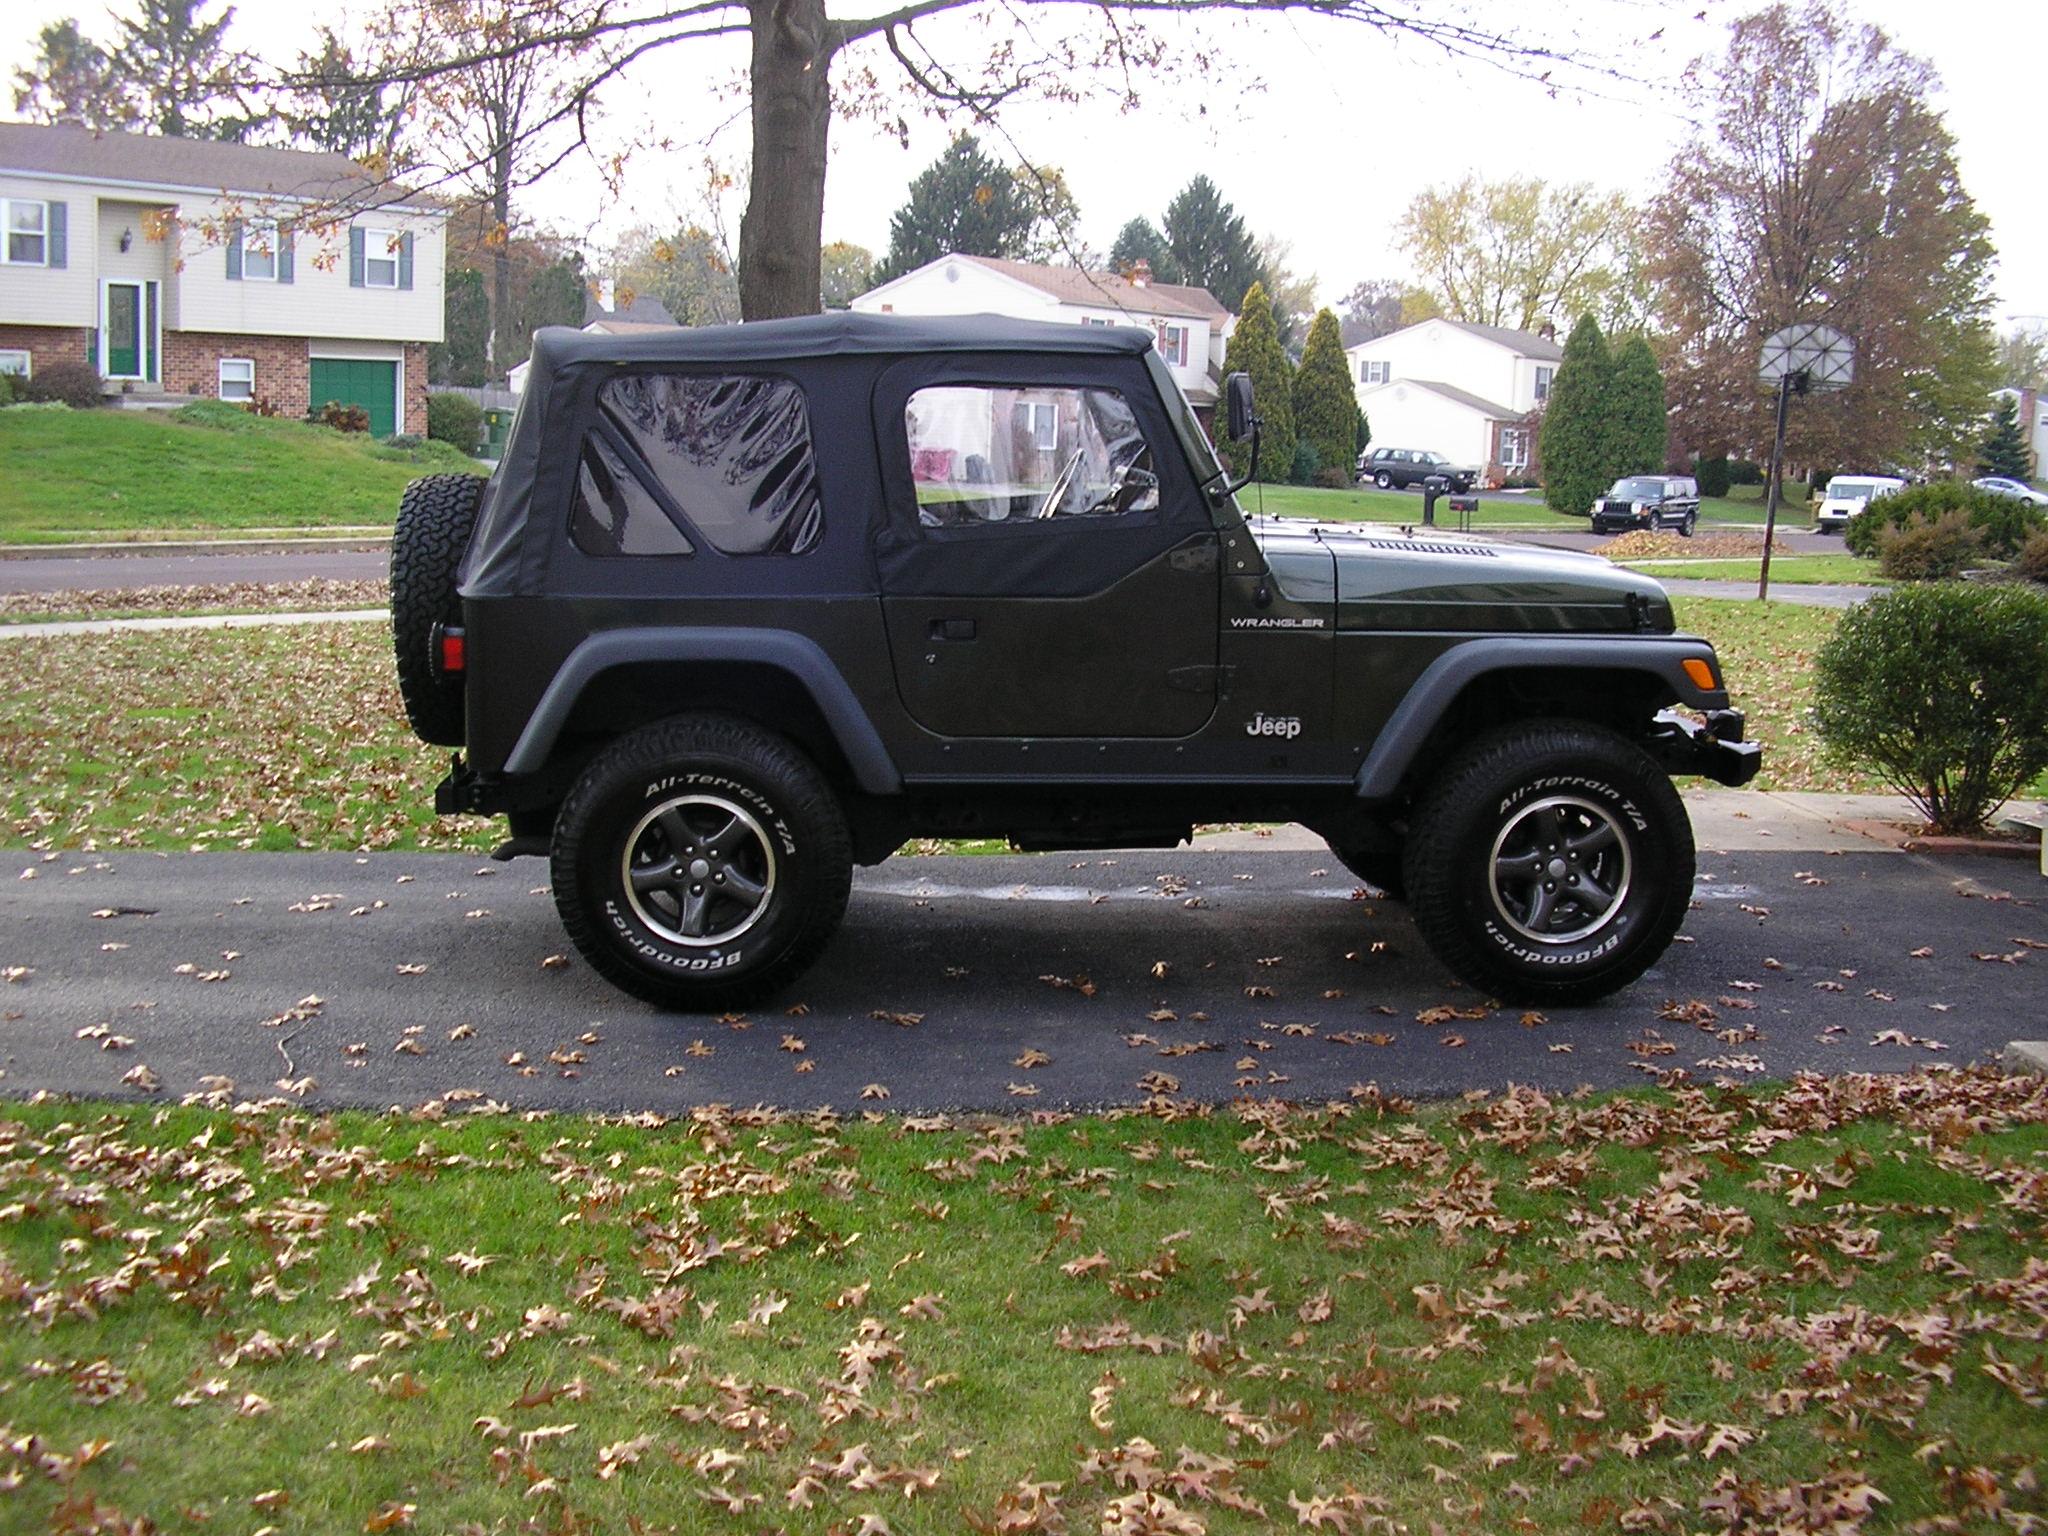 Marks_Jeep_009.JPG